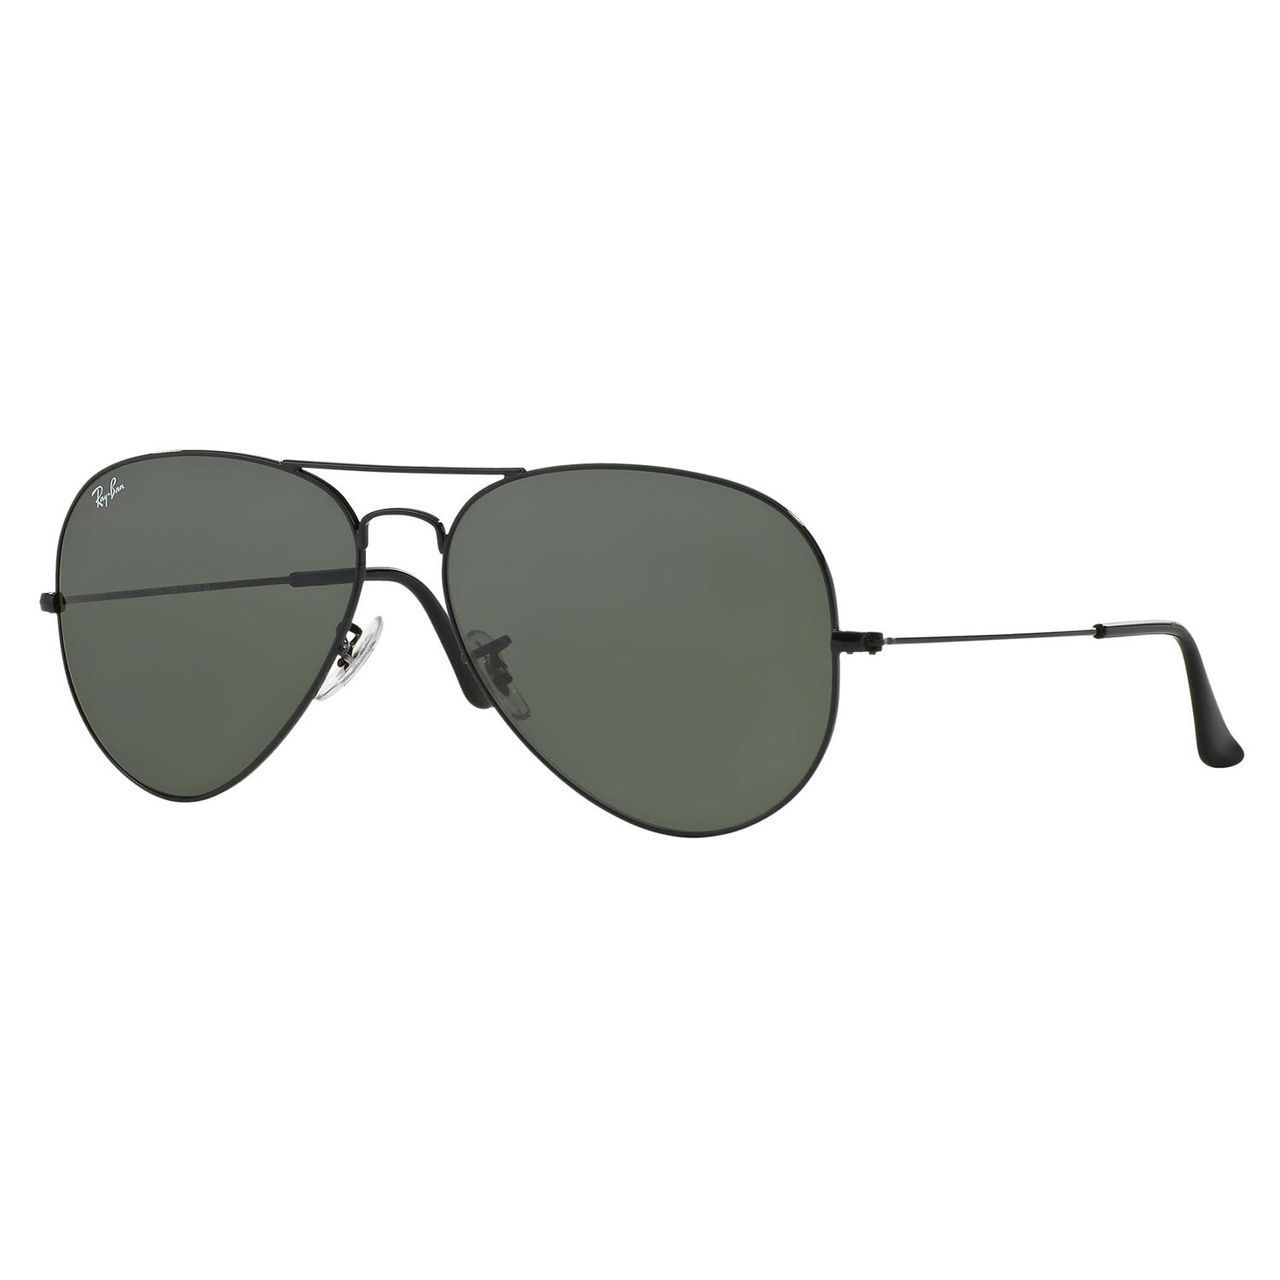 755397f549b Ray-Ban Women s Sunglasses